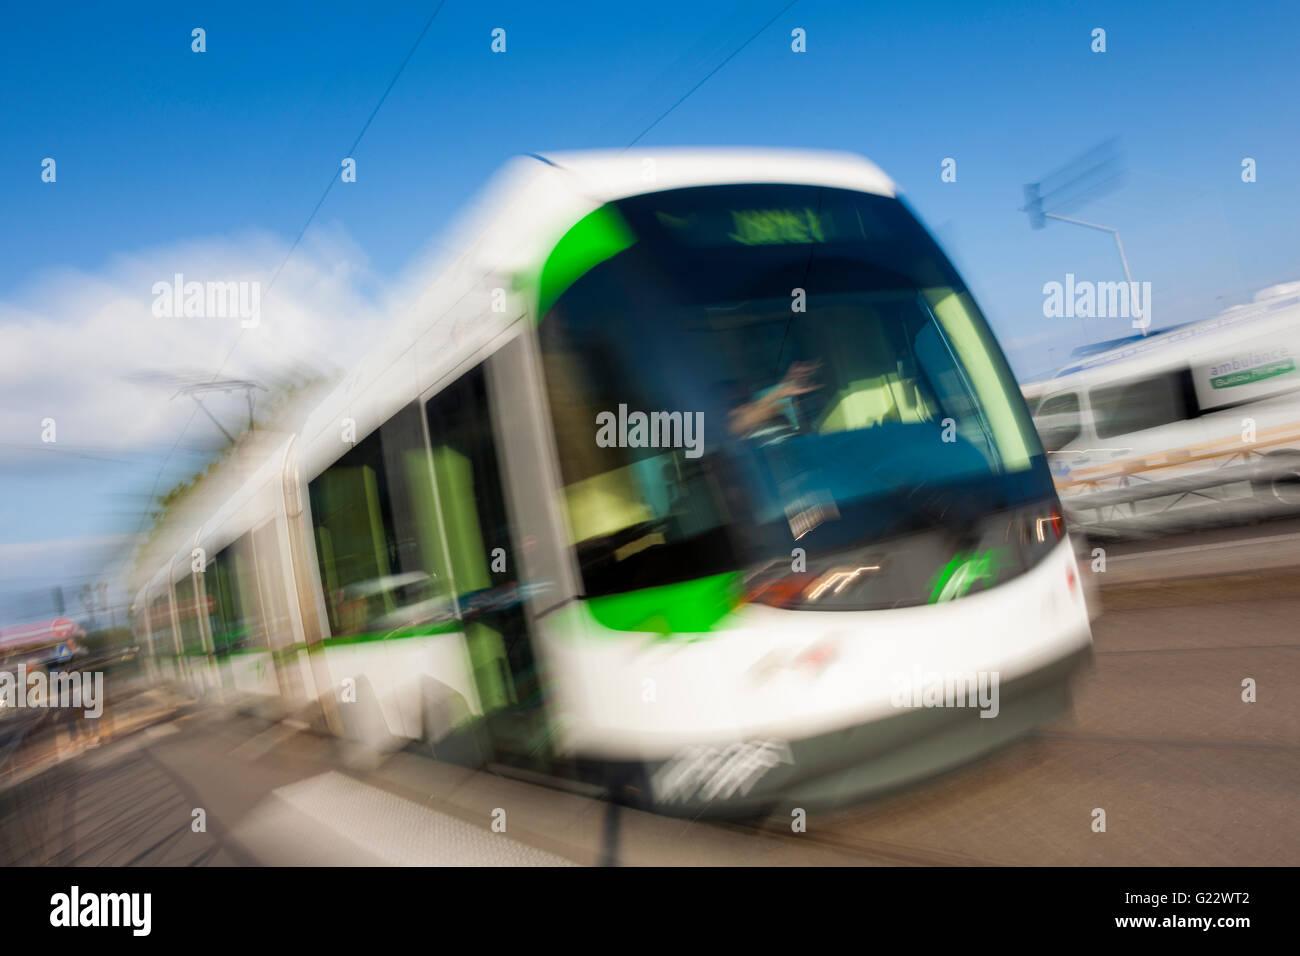 Nantes Metropole Trams,  Nantes, Pays de la Loire, France - Stock Image